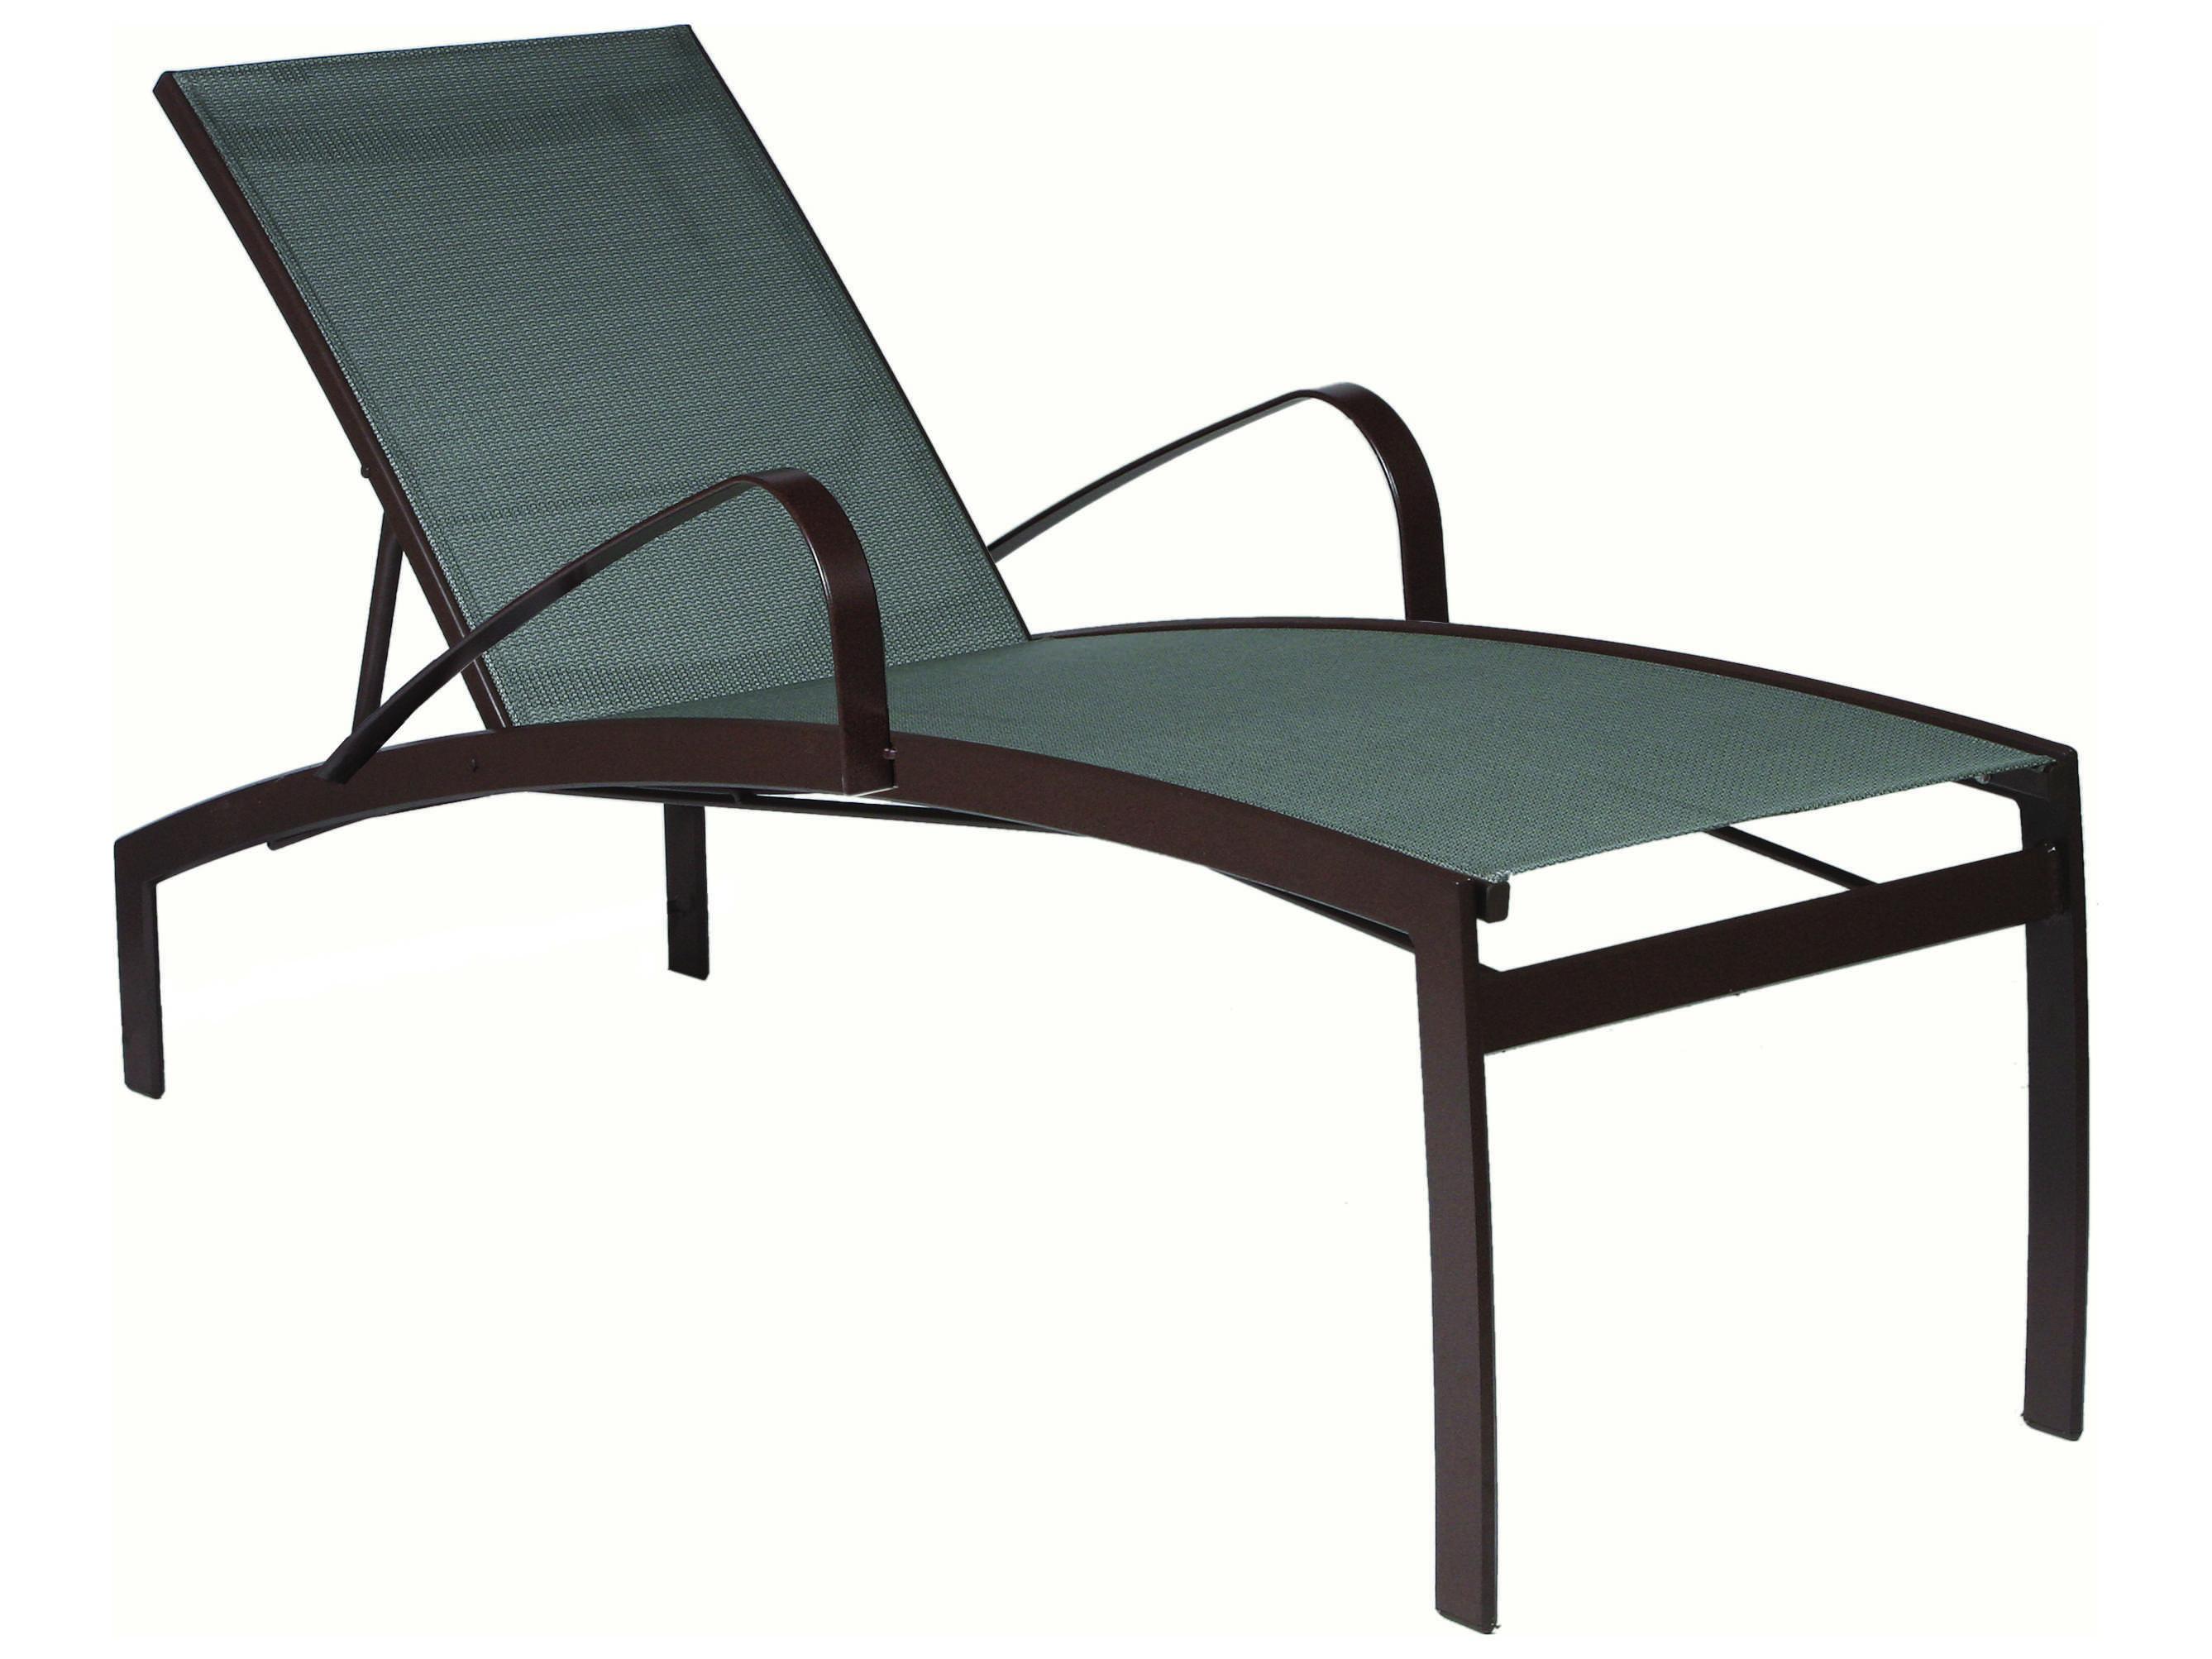 Suncoast vision sling cast aluminum chaise lounge su7994 for Aluminium chaise lounge